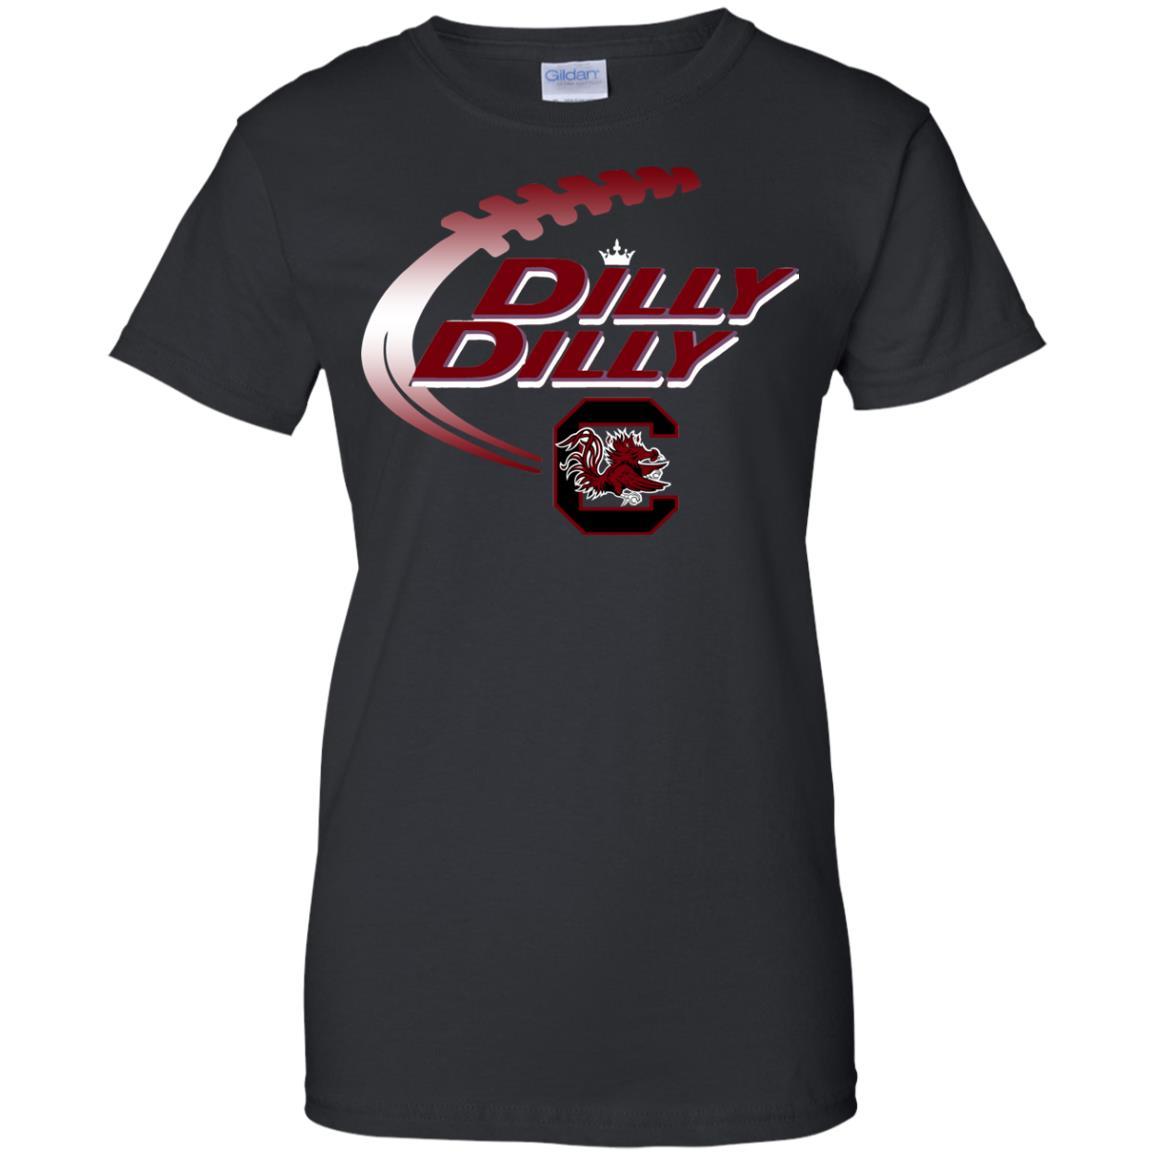 image 1703 - Dilly Dilly South Carolina Gamecocks shirt & sweatshirt